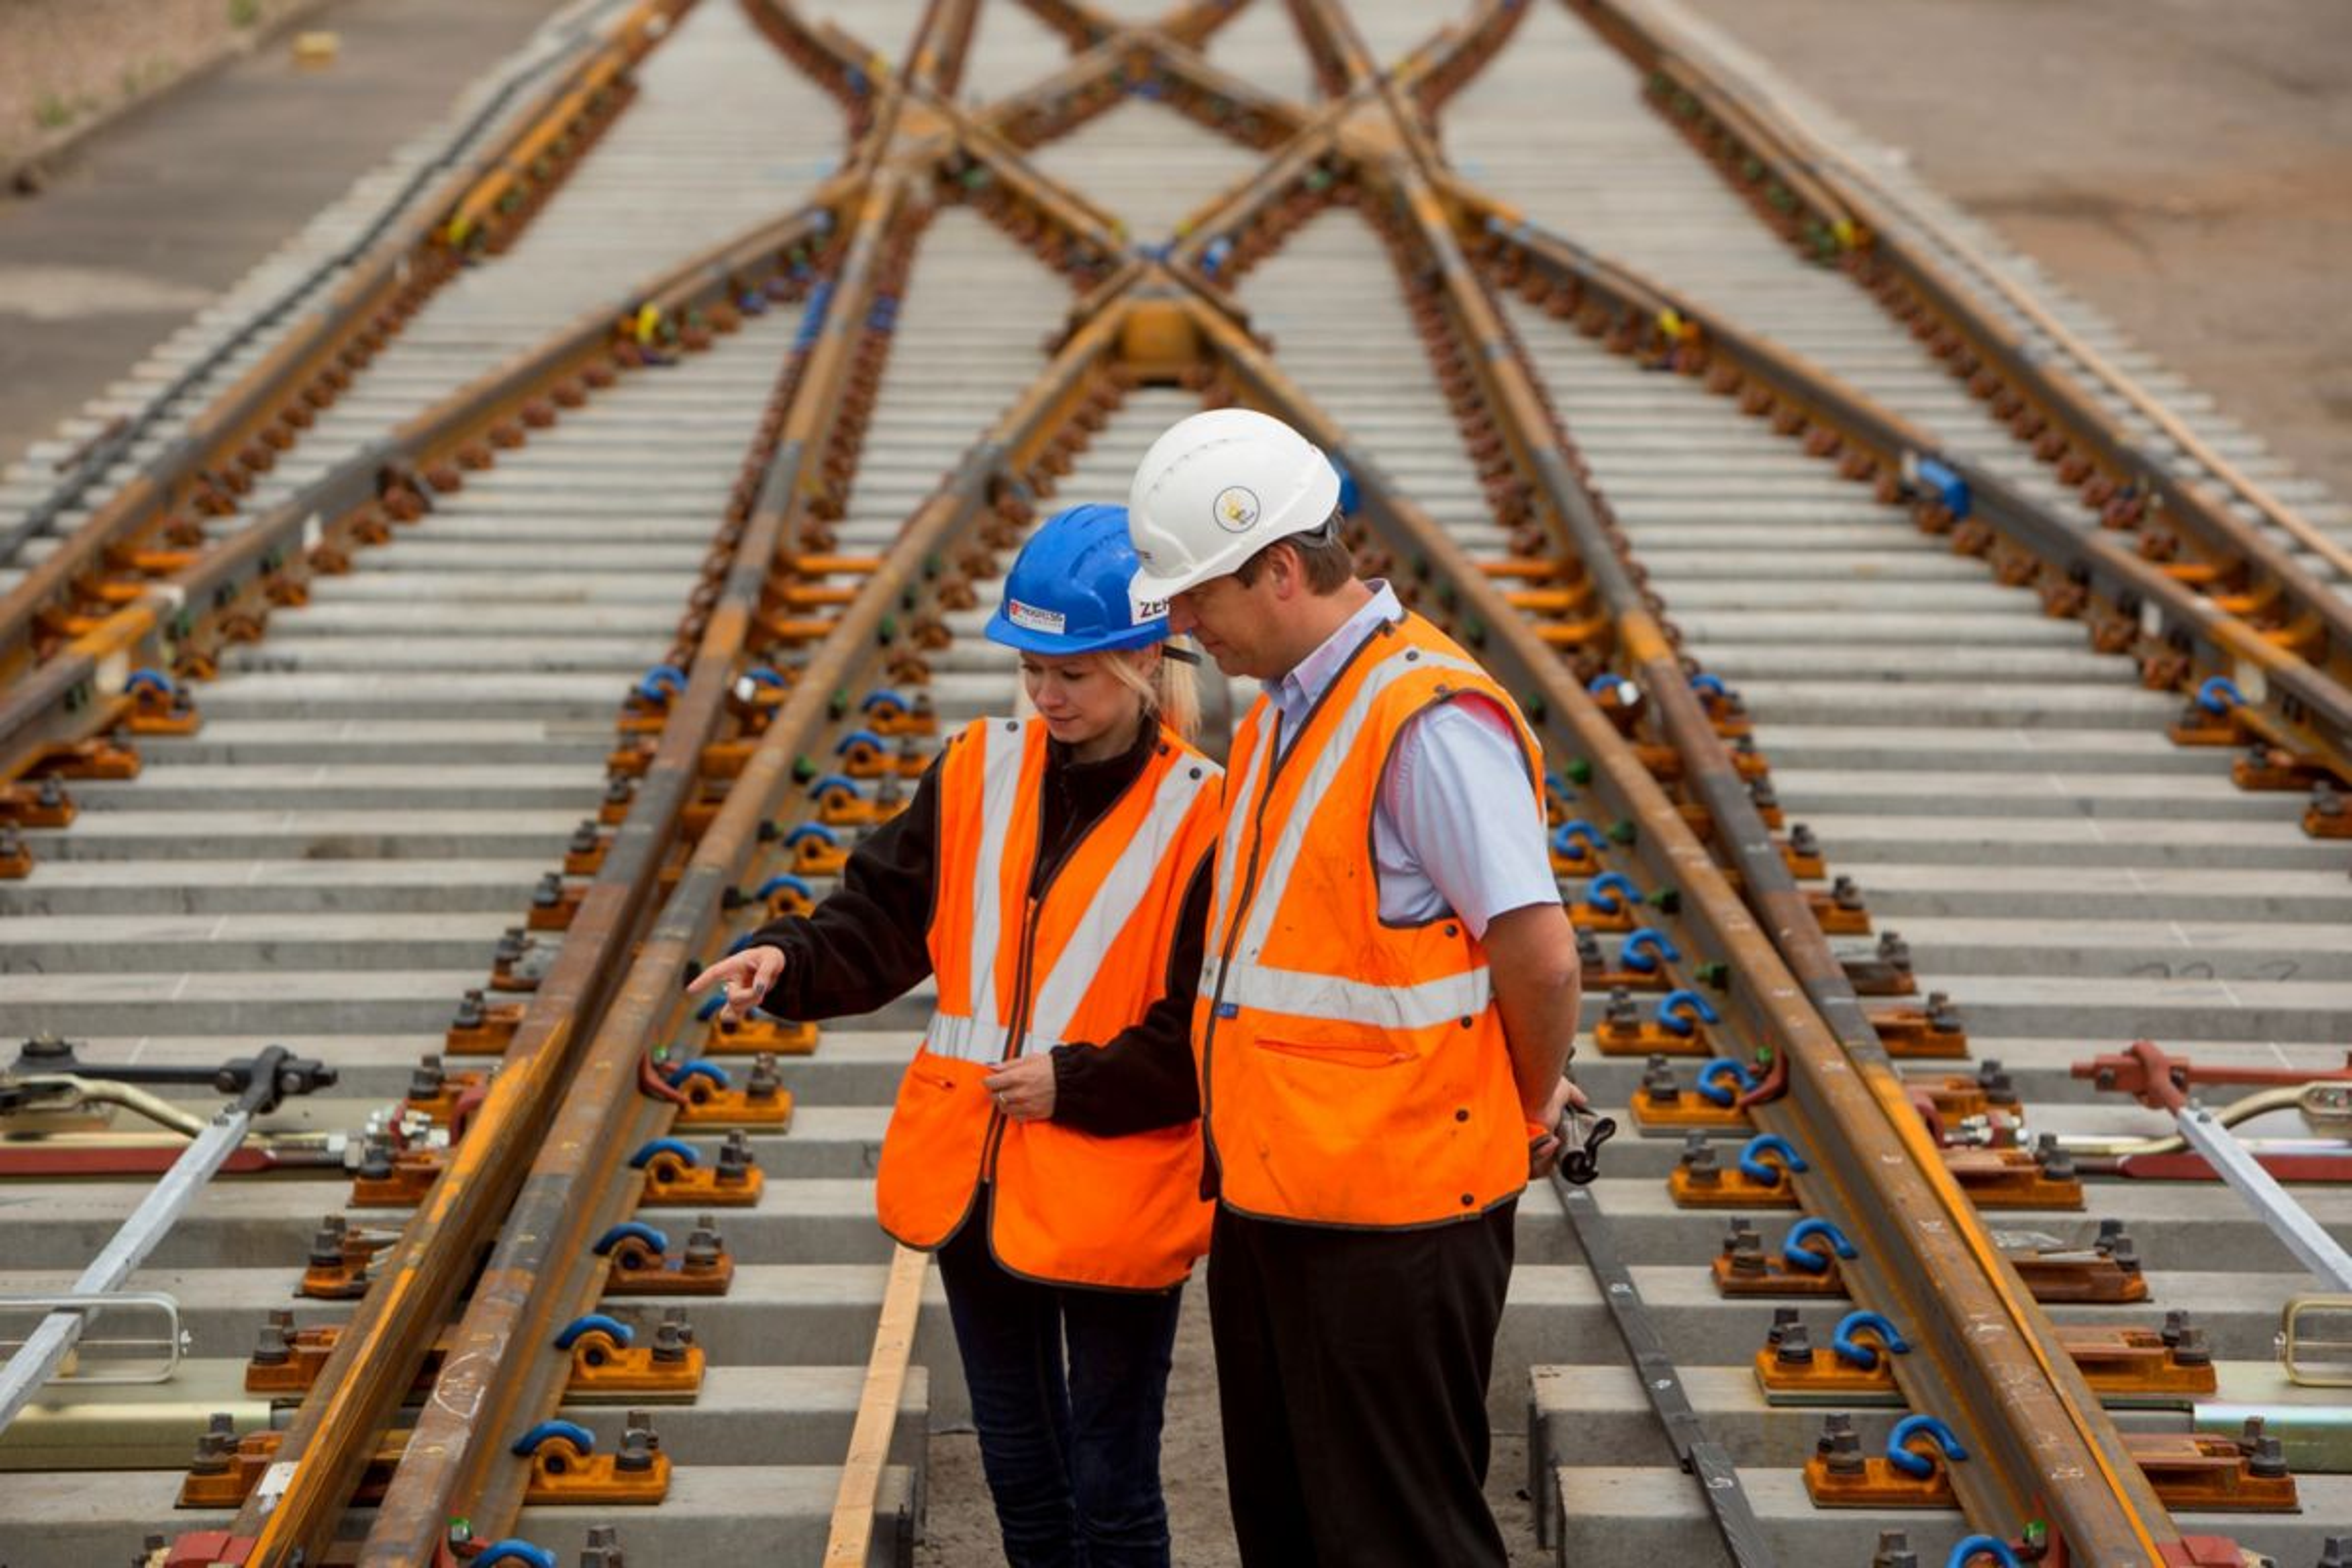 Progress Rail Services UK Ltd.